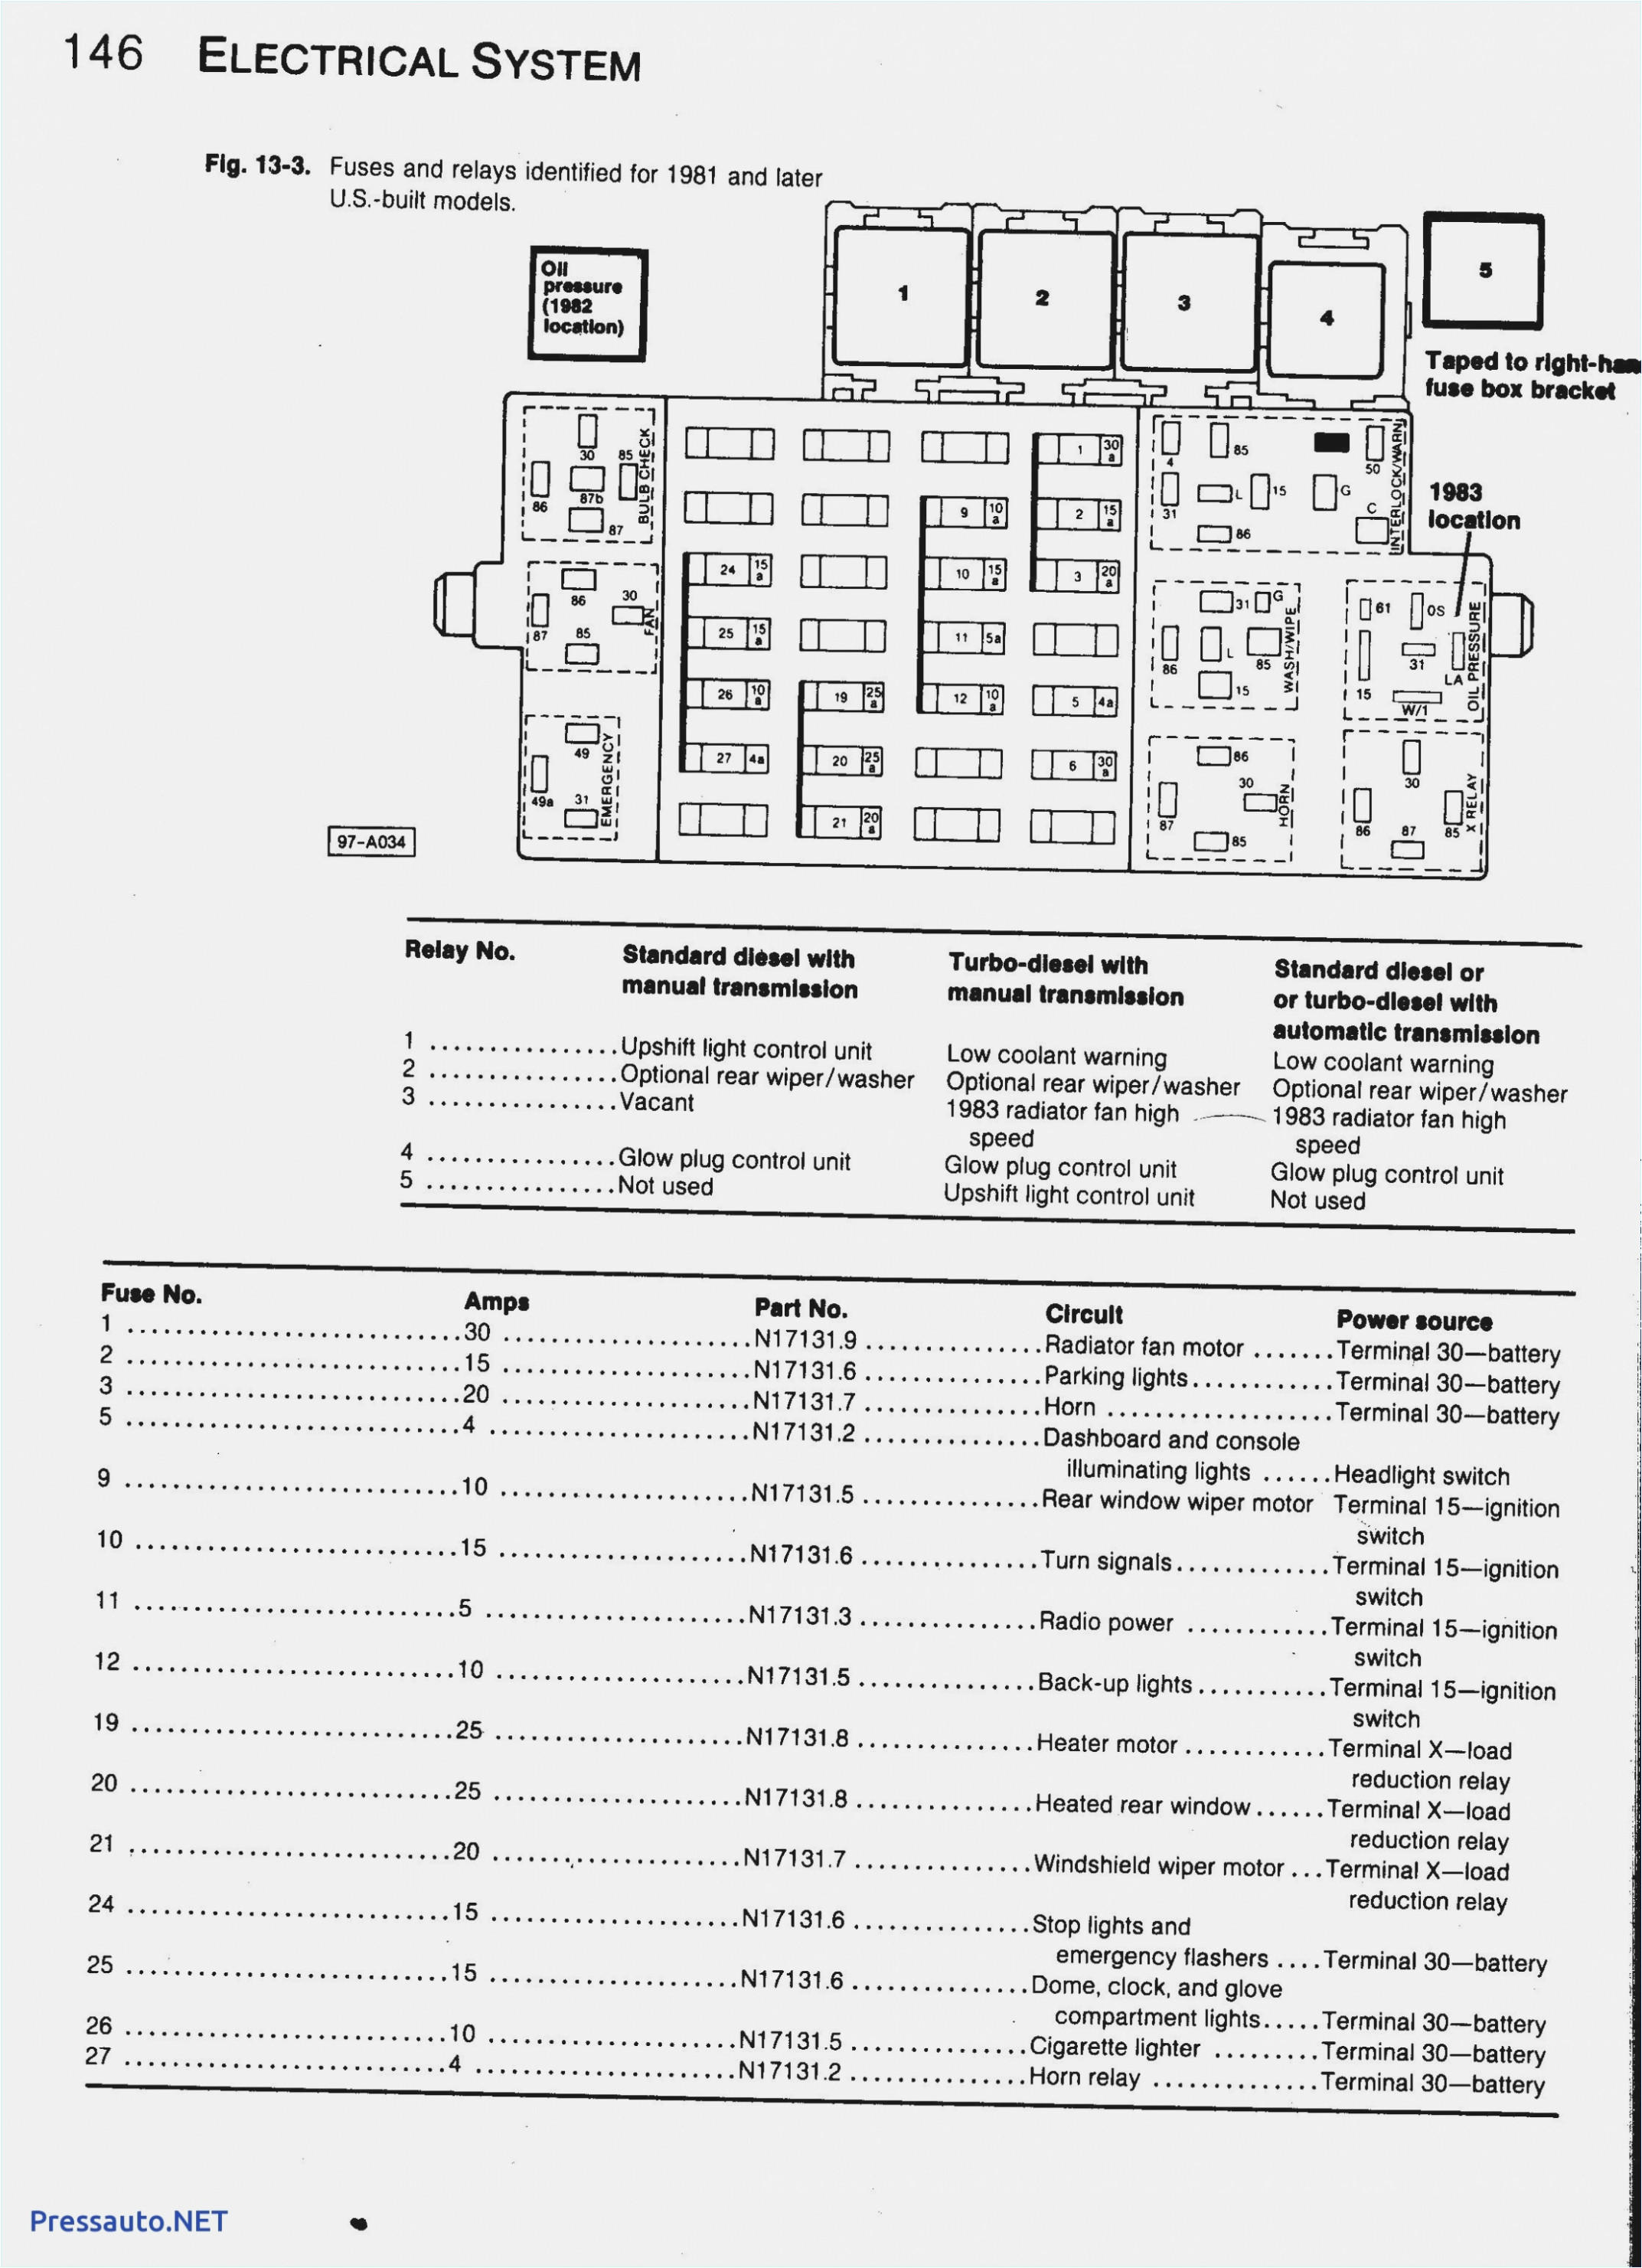 2013 vw jetta fuse box diagram wiring diagram name